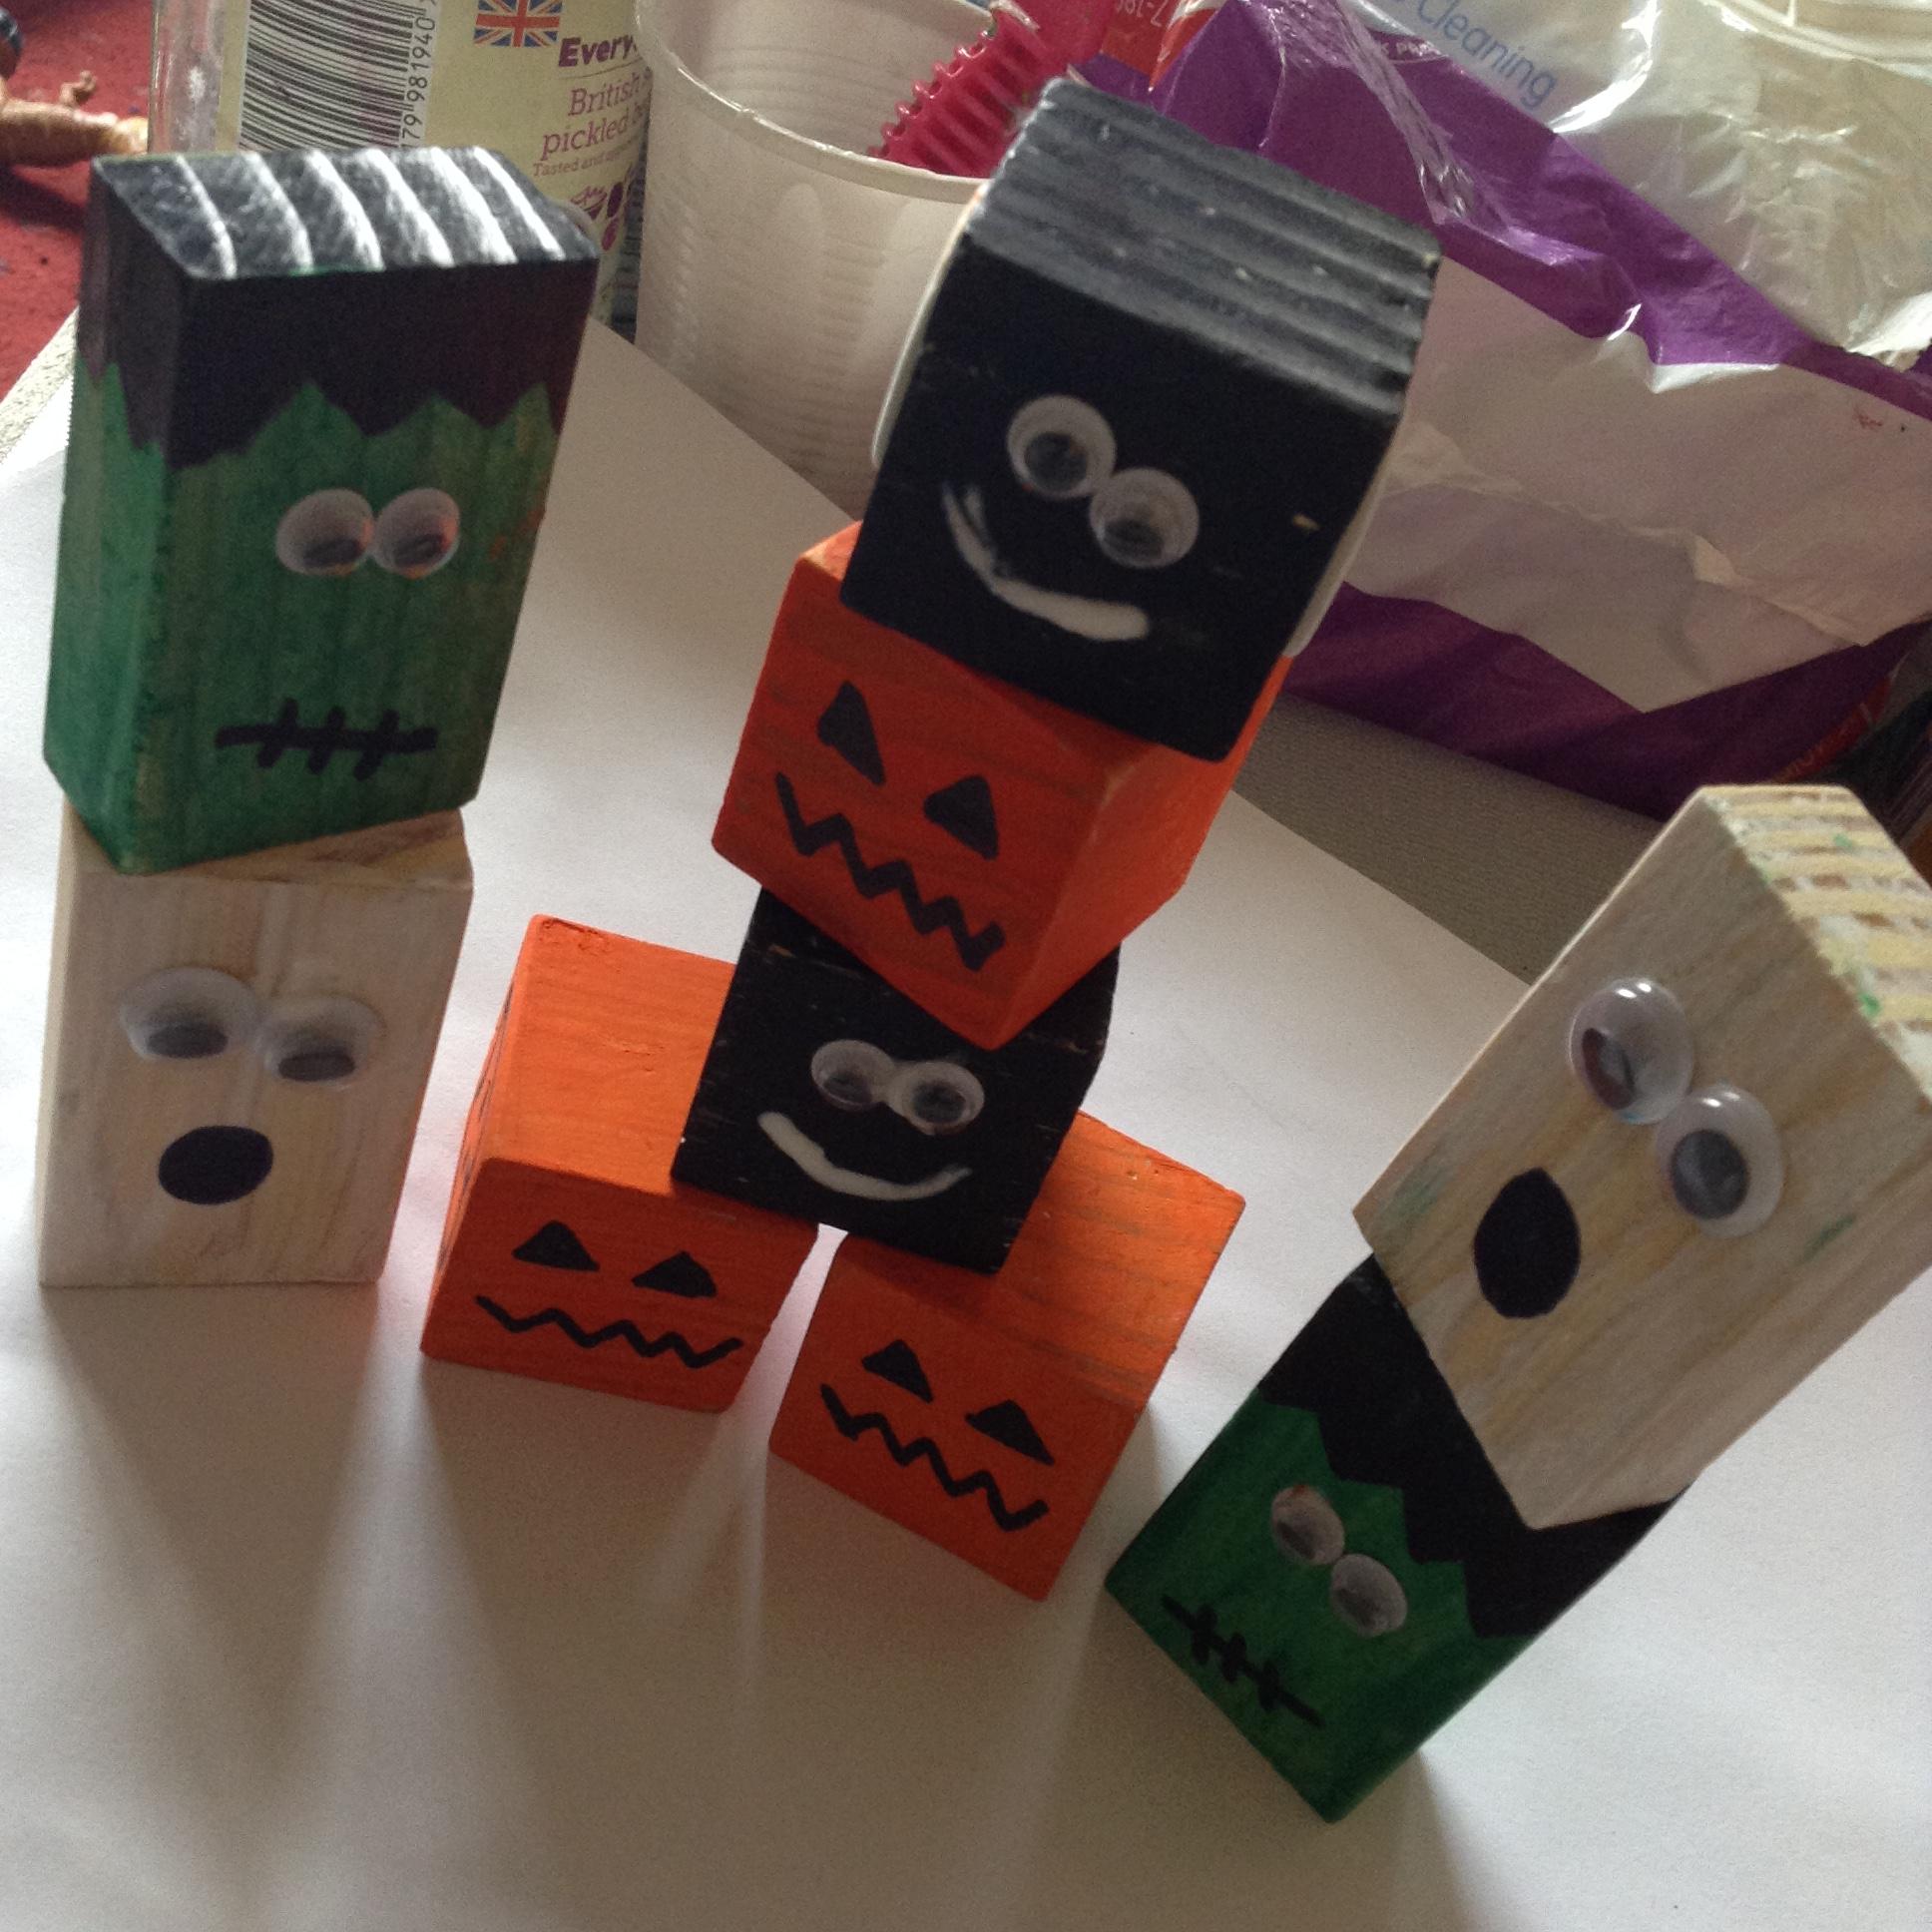 Halloween Wooden Blocks Fun Family Crafts